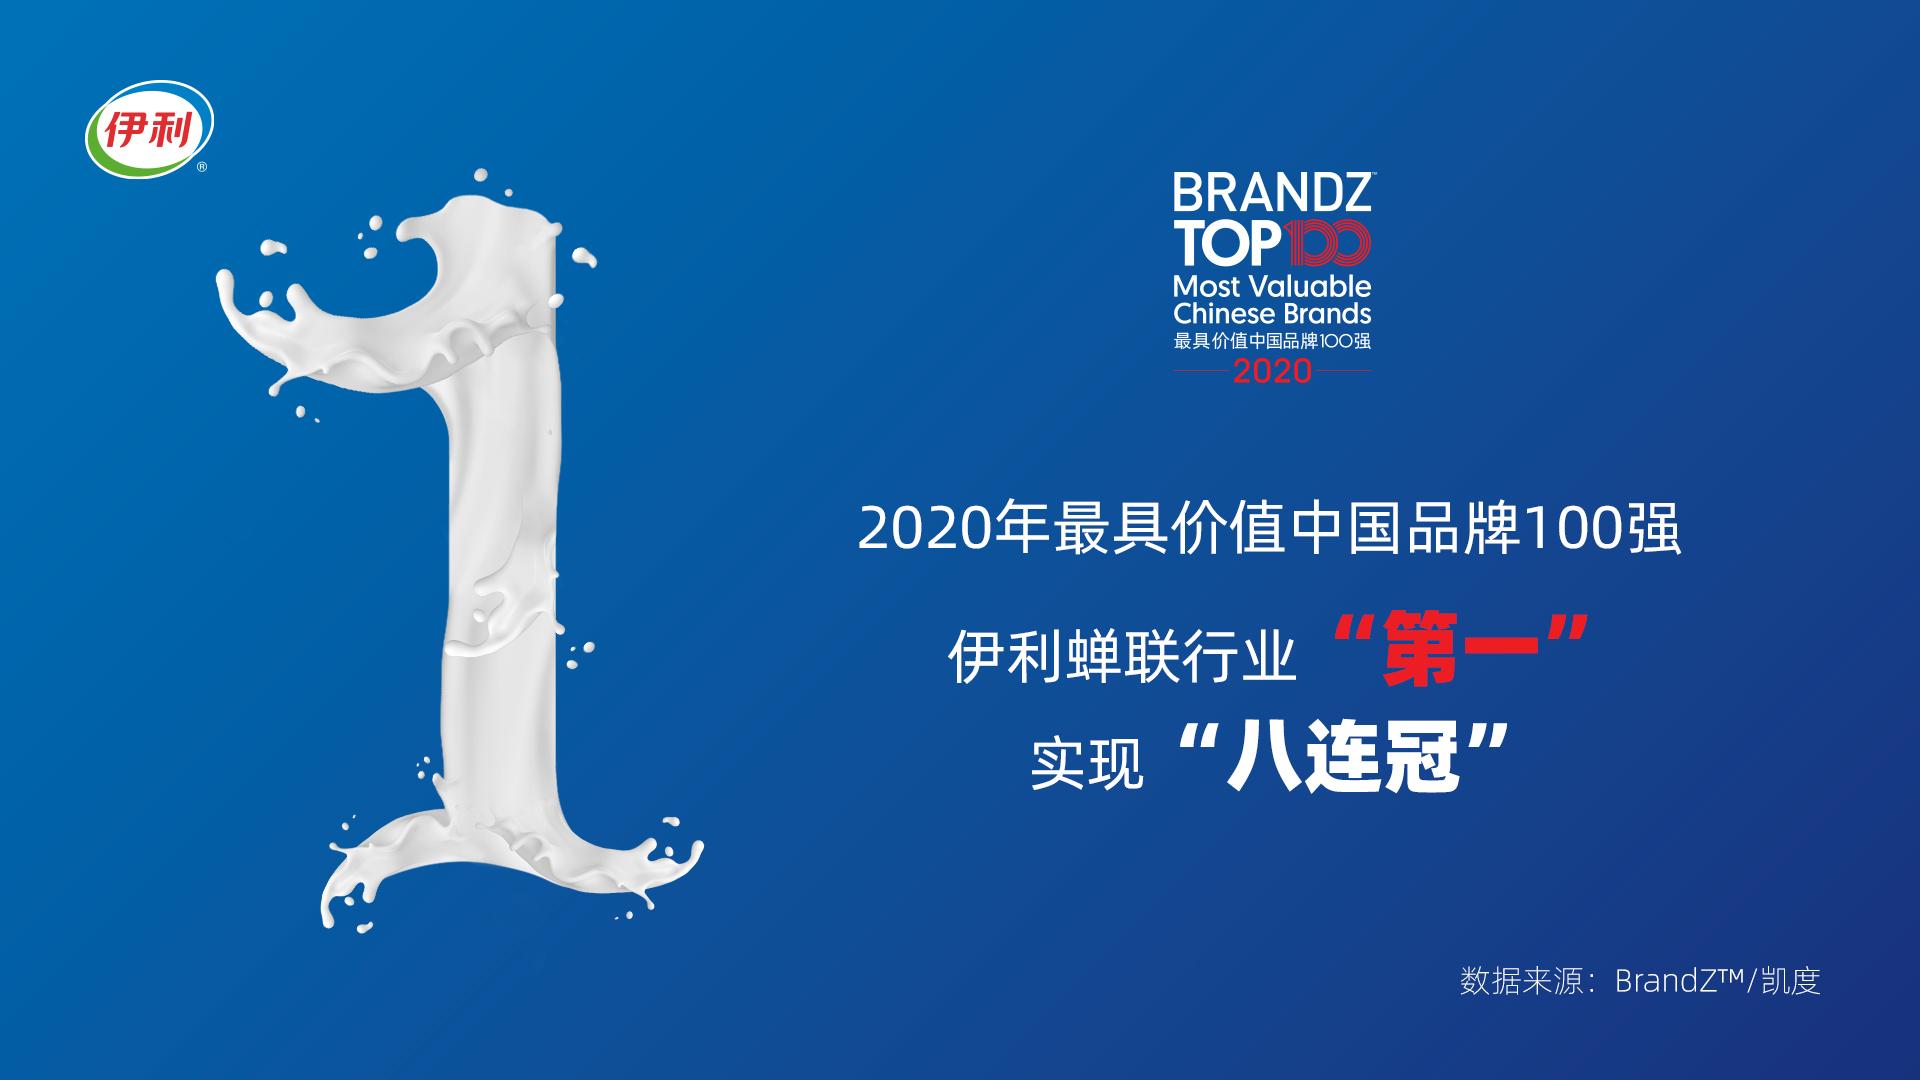 "BrandZ发布""2020年最具价值中国品牌100强"" 伊利连续8年蝉联行业第一_fororder_111"